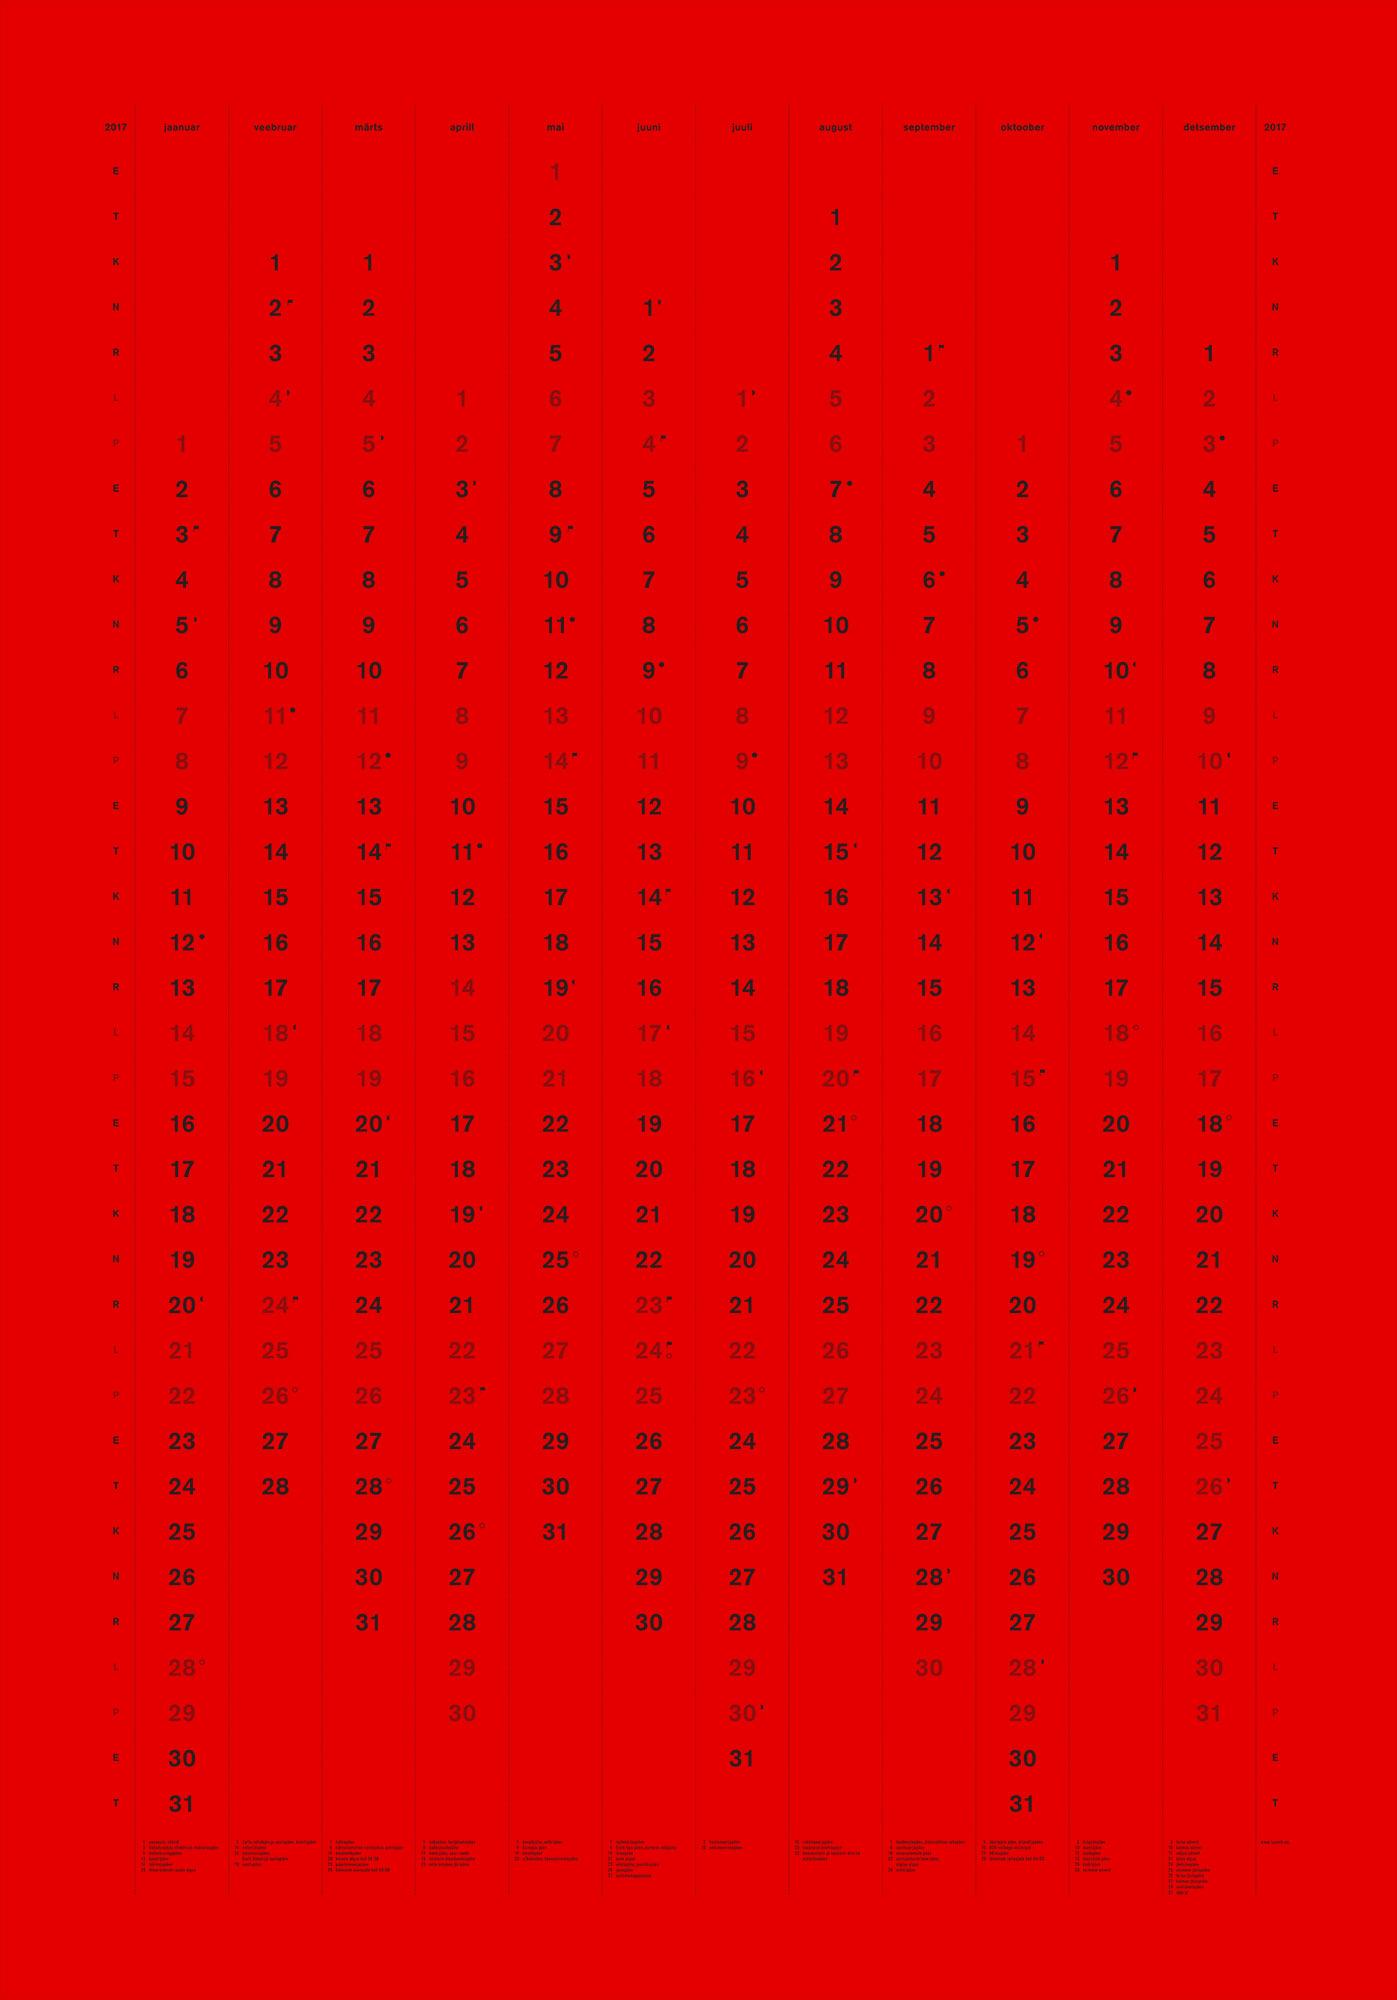 Tuumik_seinakalender2017_red